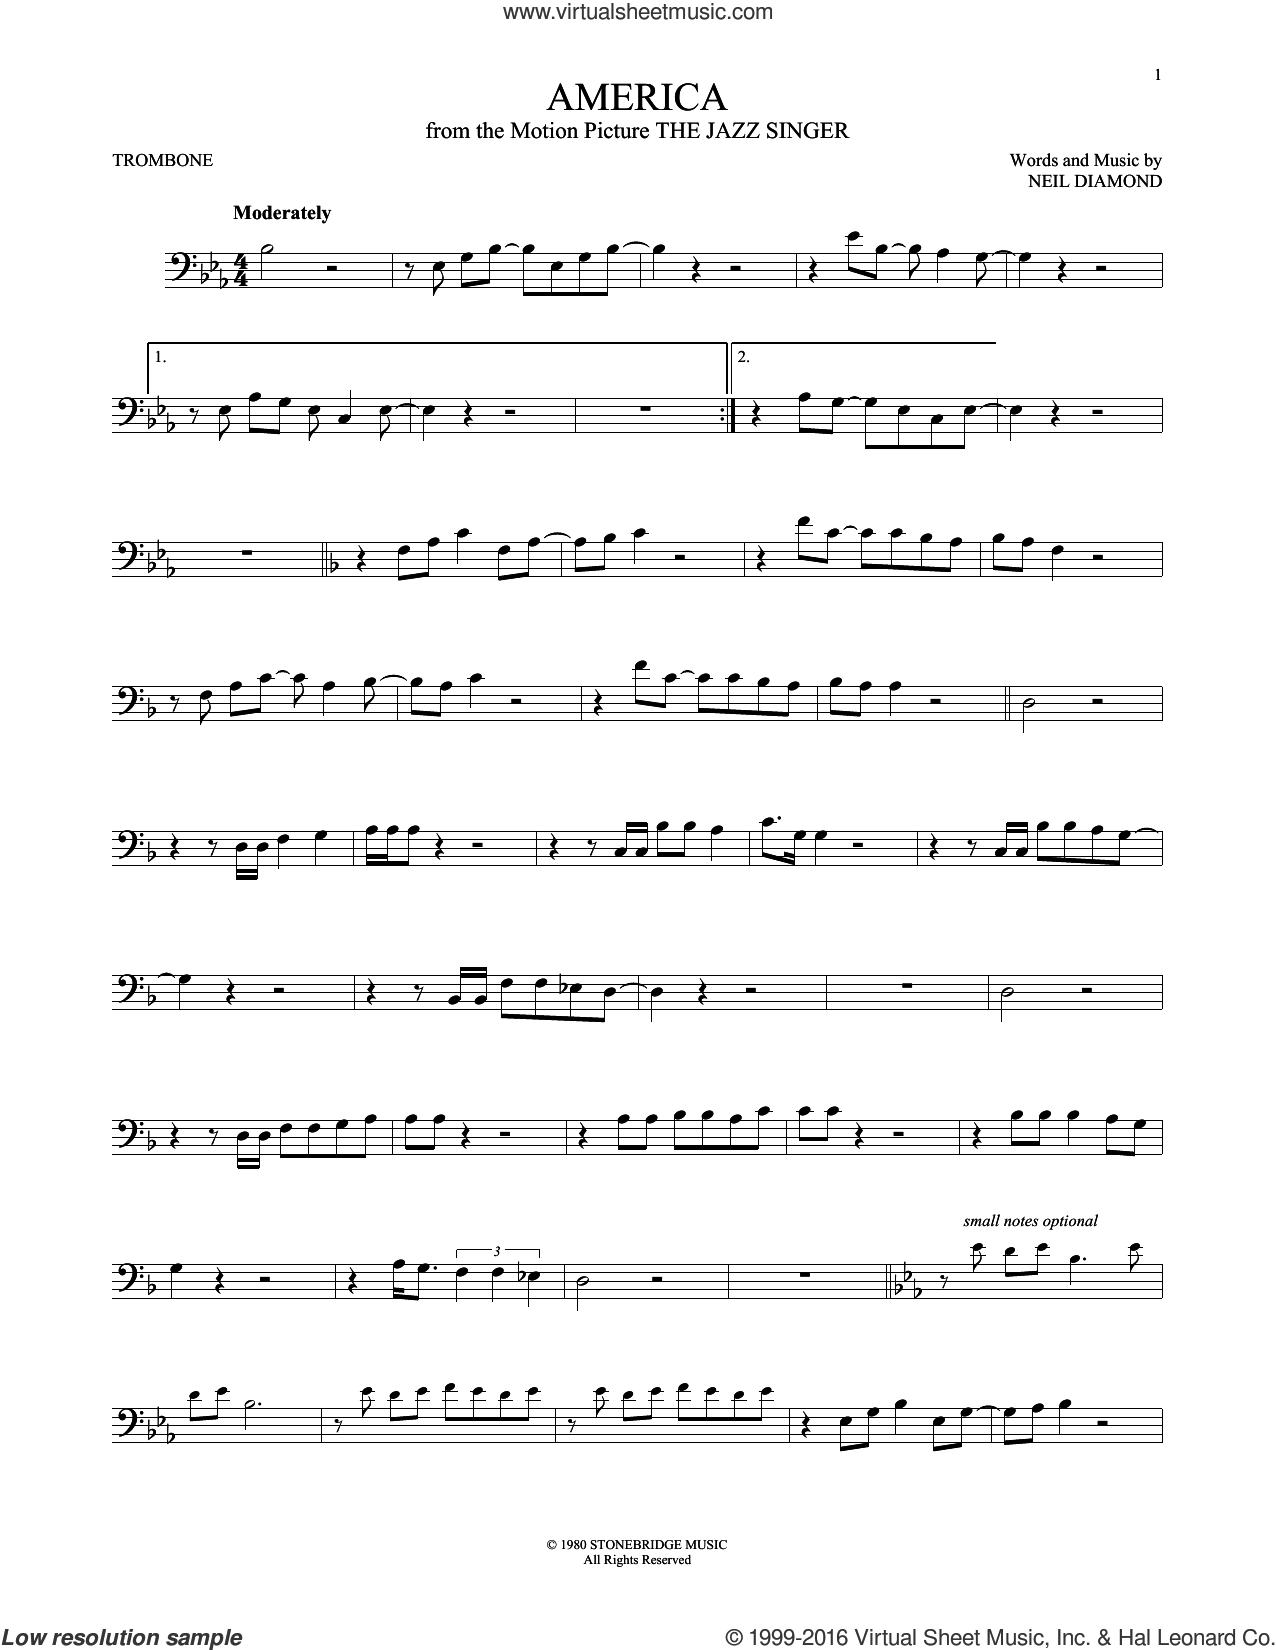 America sheet music for trombone solo by Neil Diamond, intermediate skill level